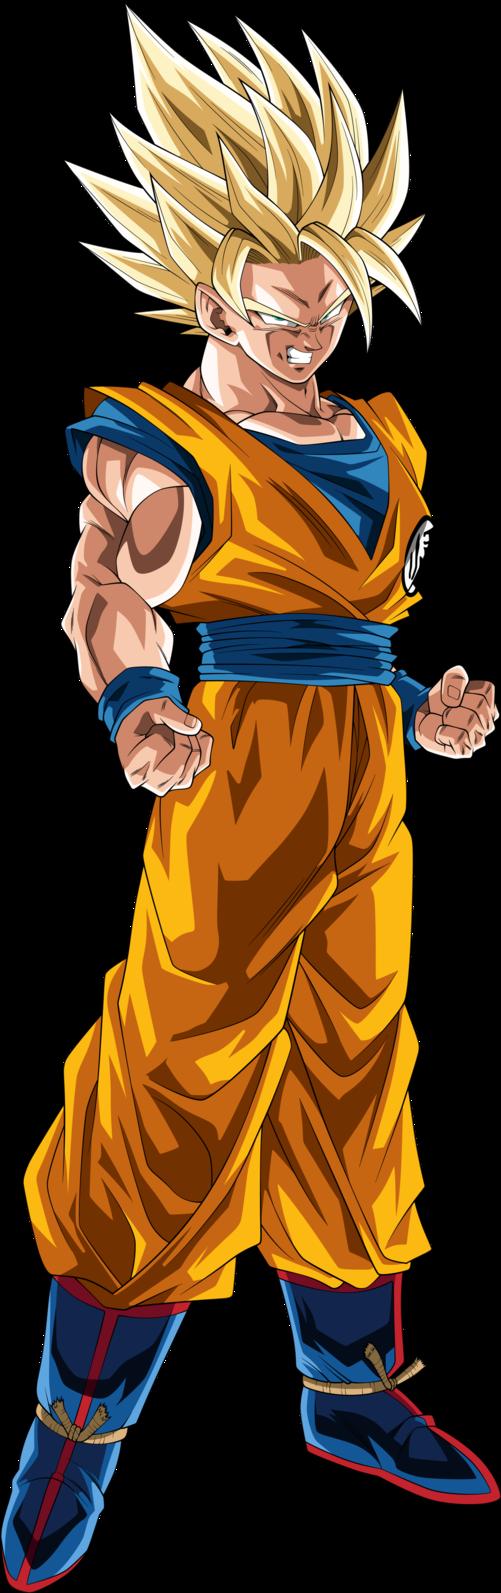 Goku Super Saiyan 2 Shintani Palette By Thetabbyneko Dragon Ball Anime Dragon Ball Super Dragon Ball Super Art